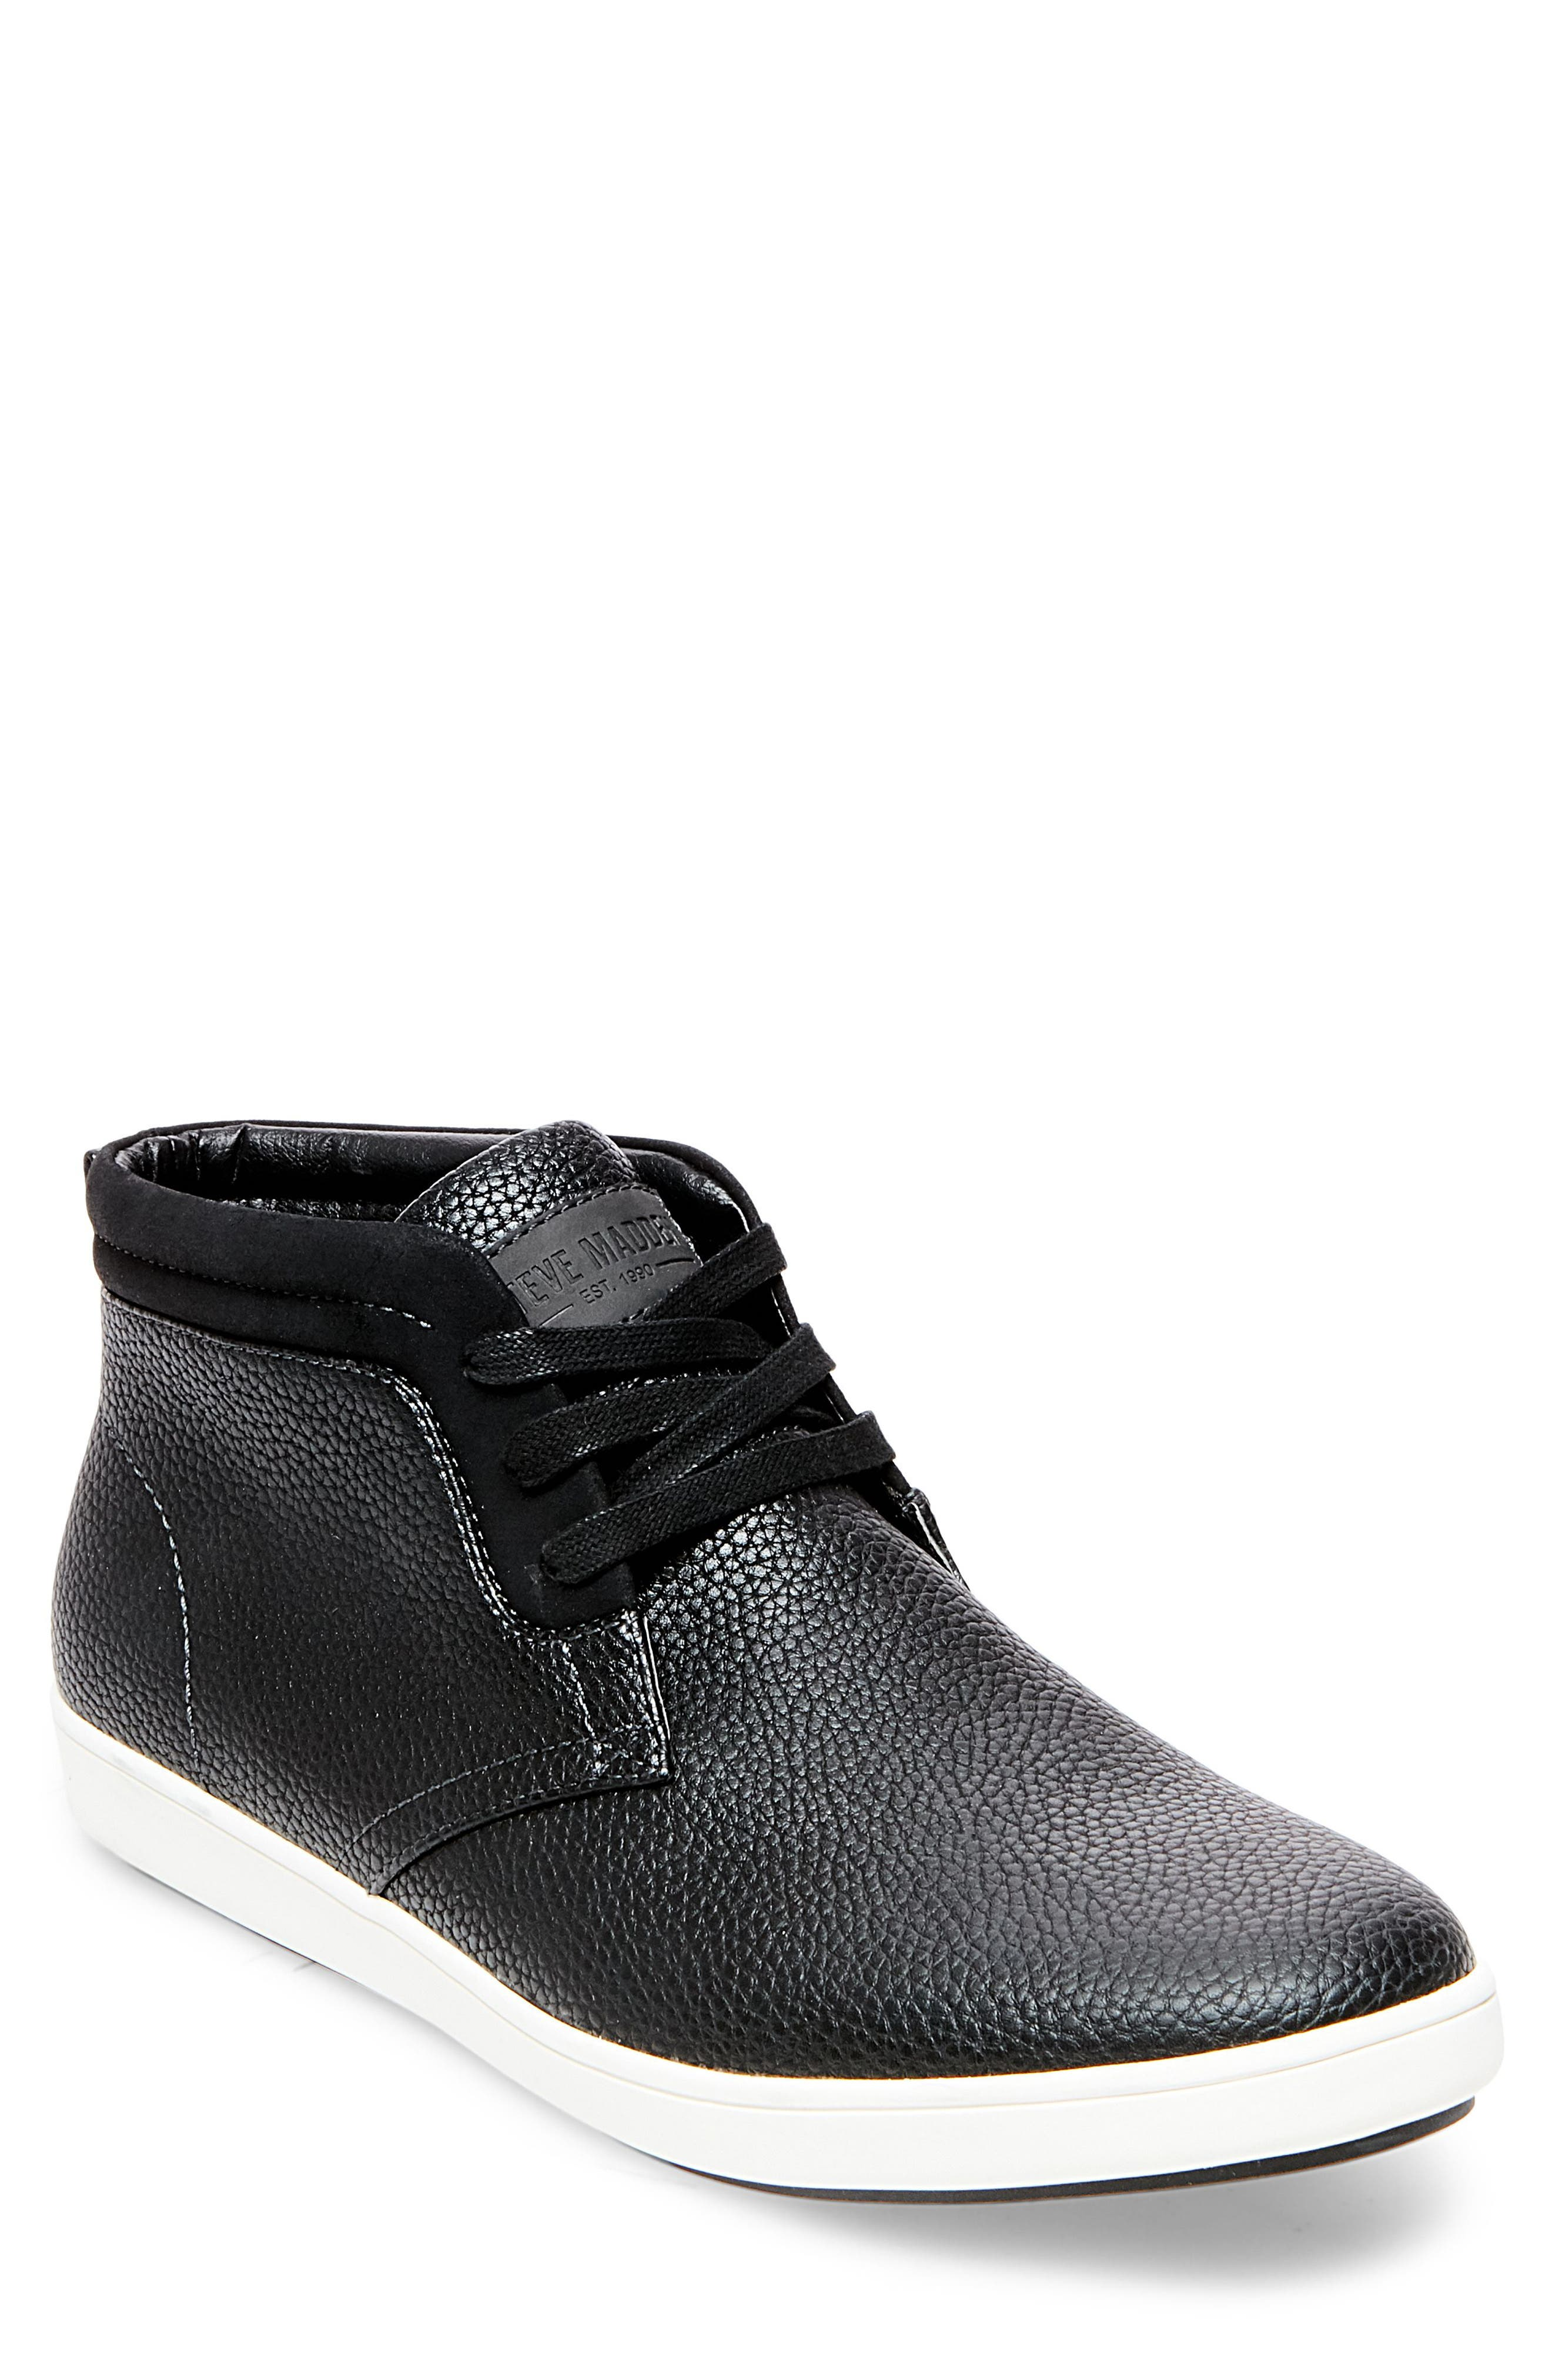 Fenway Sneaker,                         Main,                         color, Black Leather